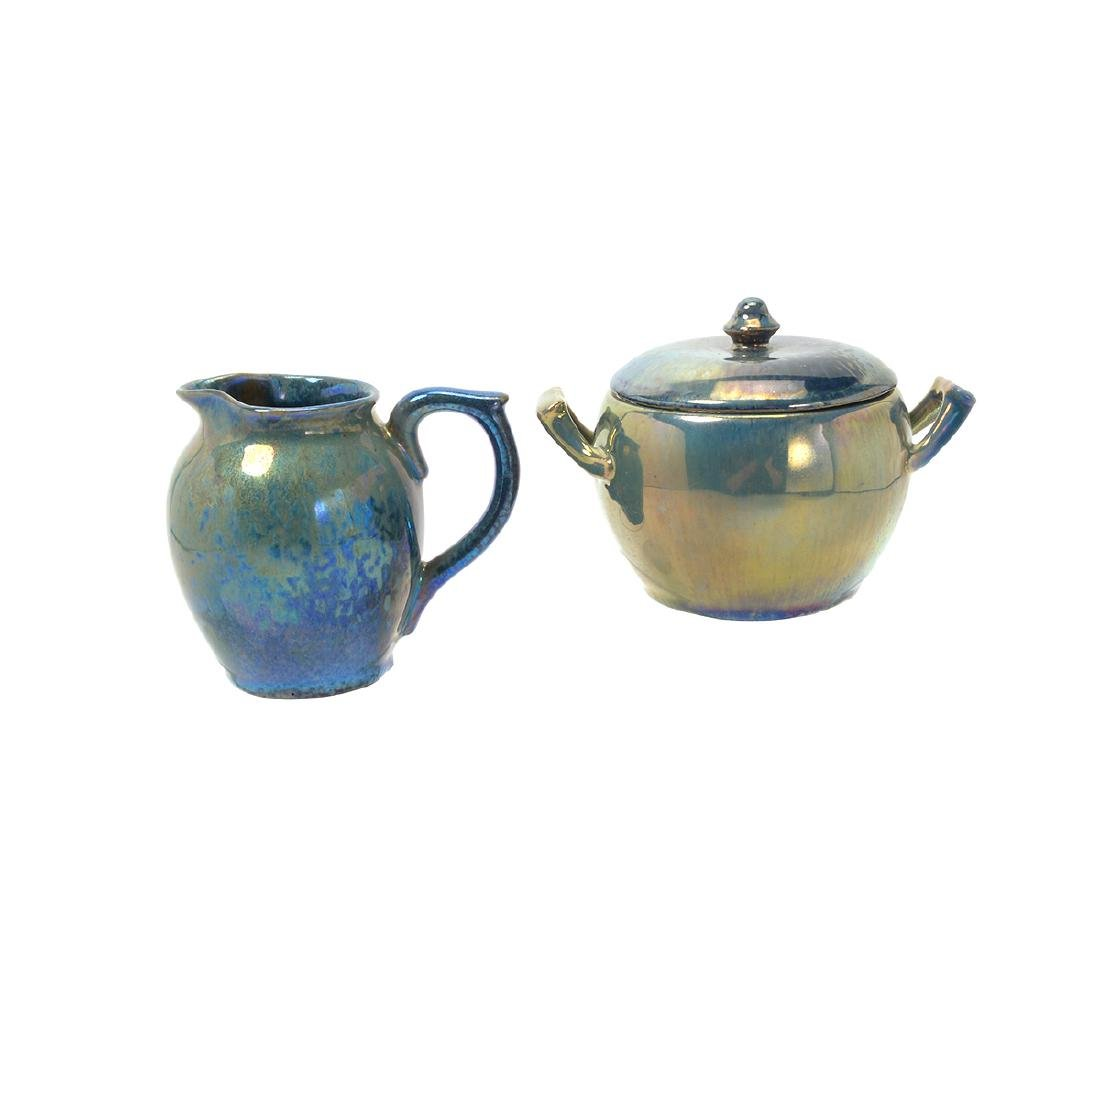 Alphonse Cytere Iridescent Art Pottery Tea Service - 3